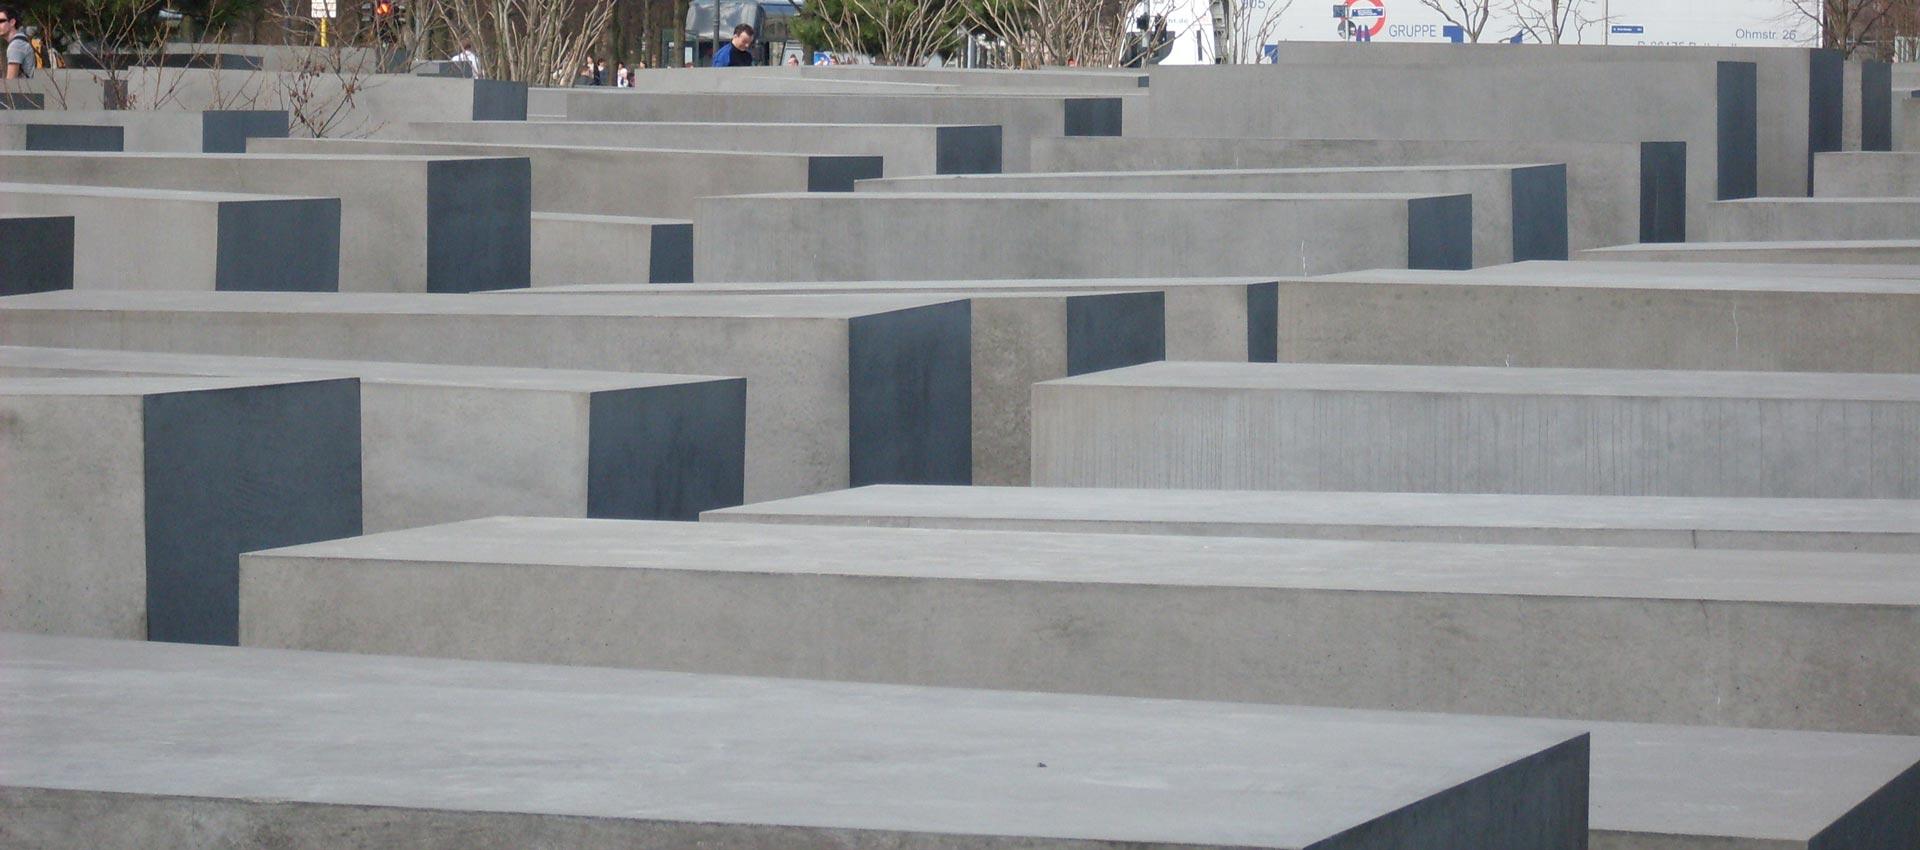 private-stadtführung-jüdisches-berlin-holocaust-denkmal